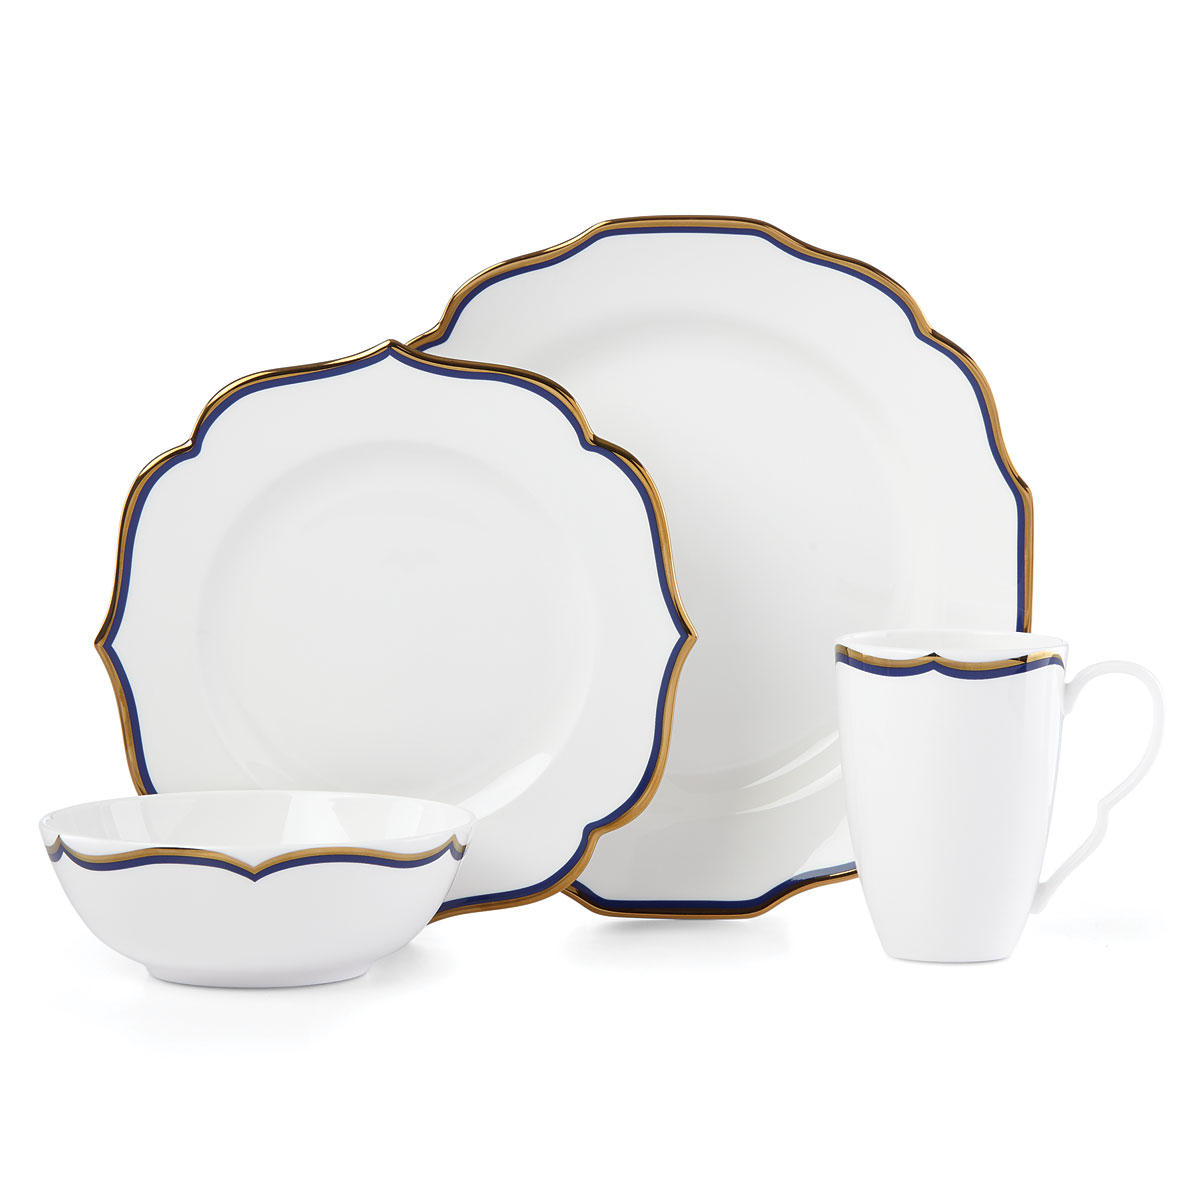 Lenox Contempo Luxe Sapphire Dinnerware 4 Piece Place Setting